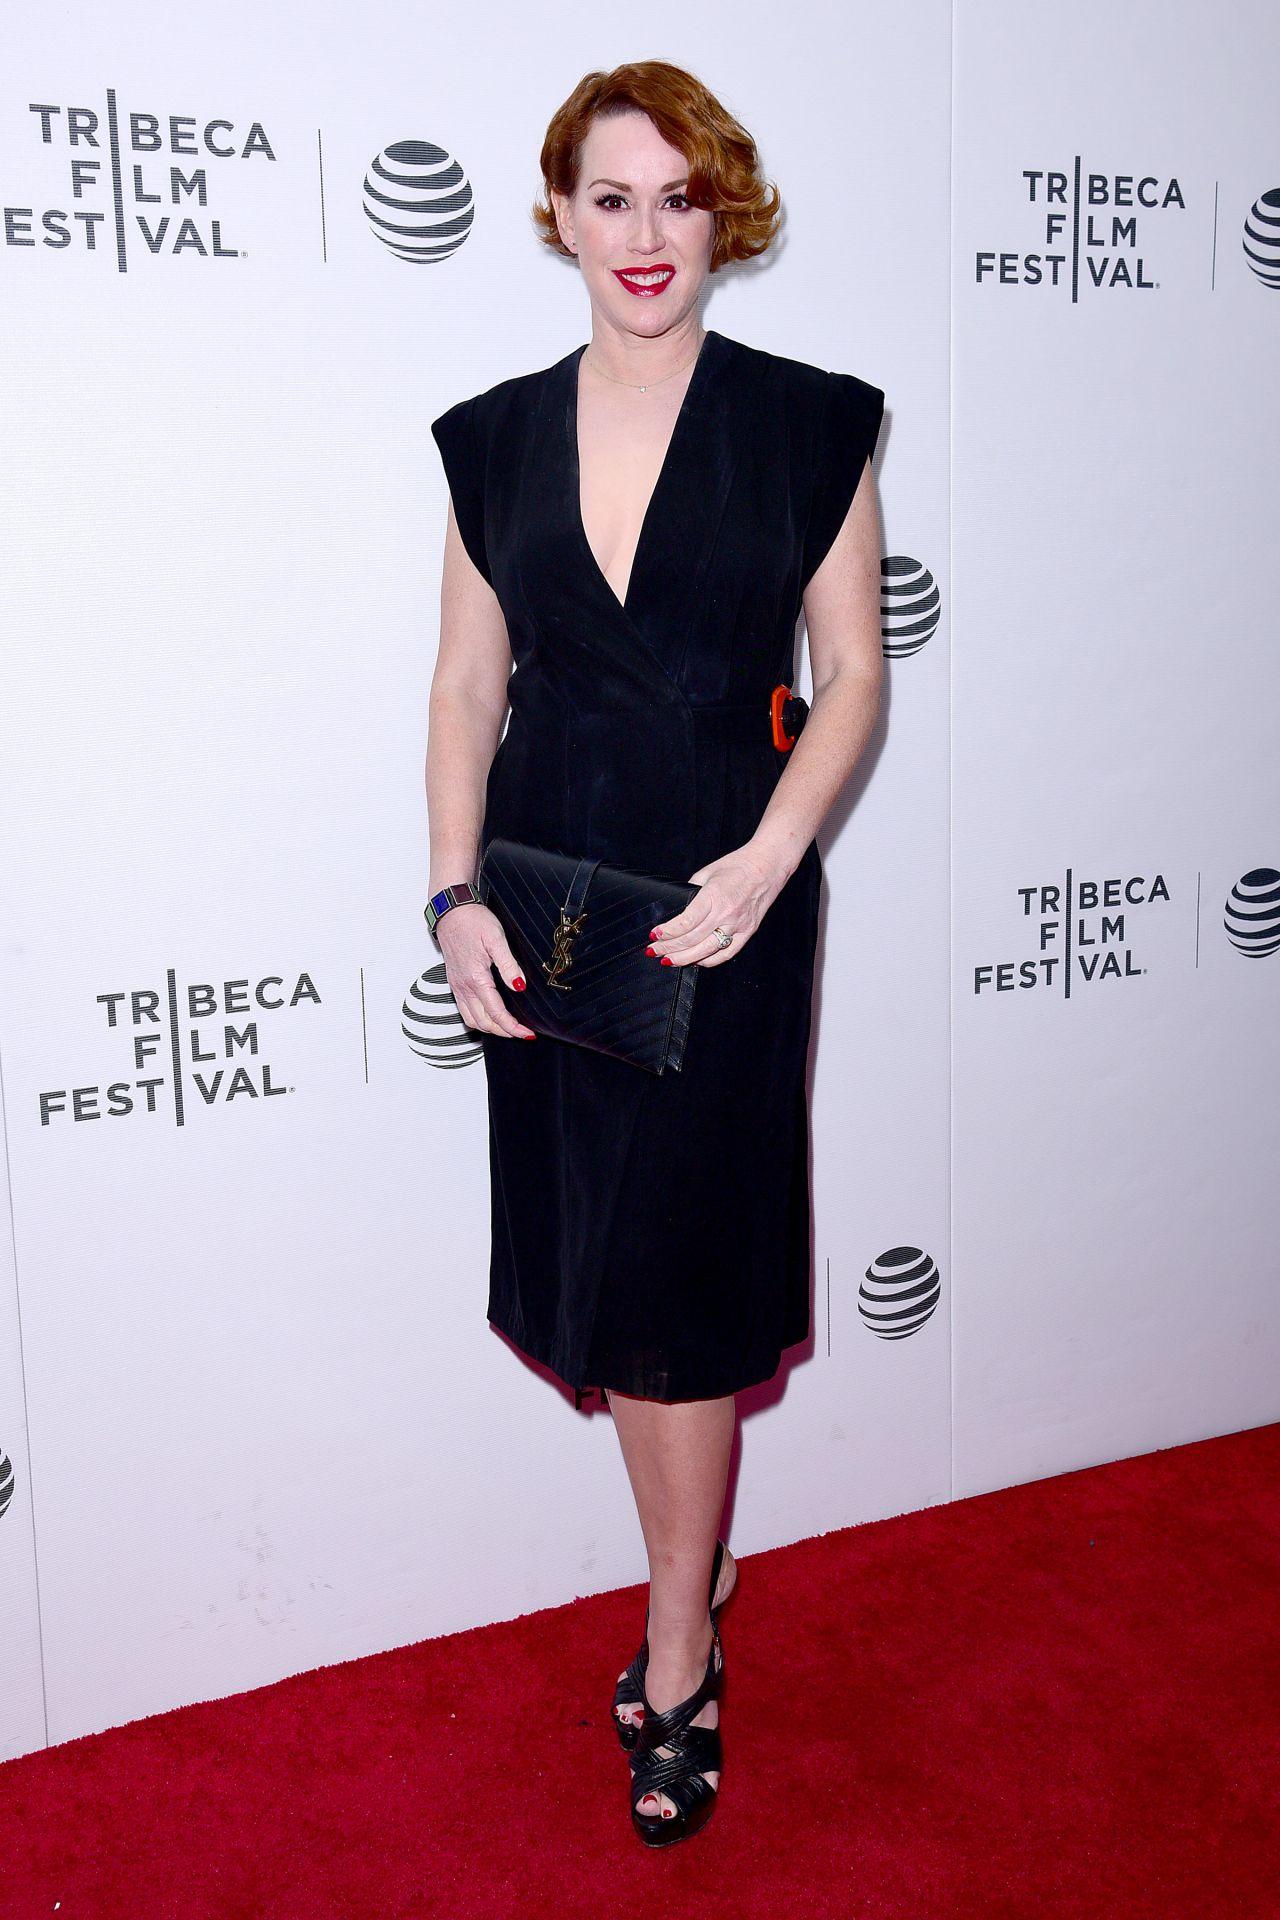 Molly Ringwald King Cobra Premiere 2016 Tribeca Film